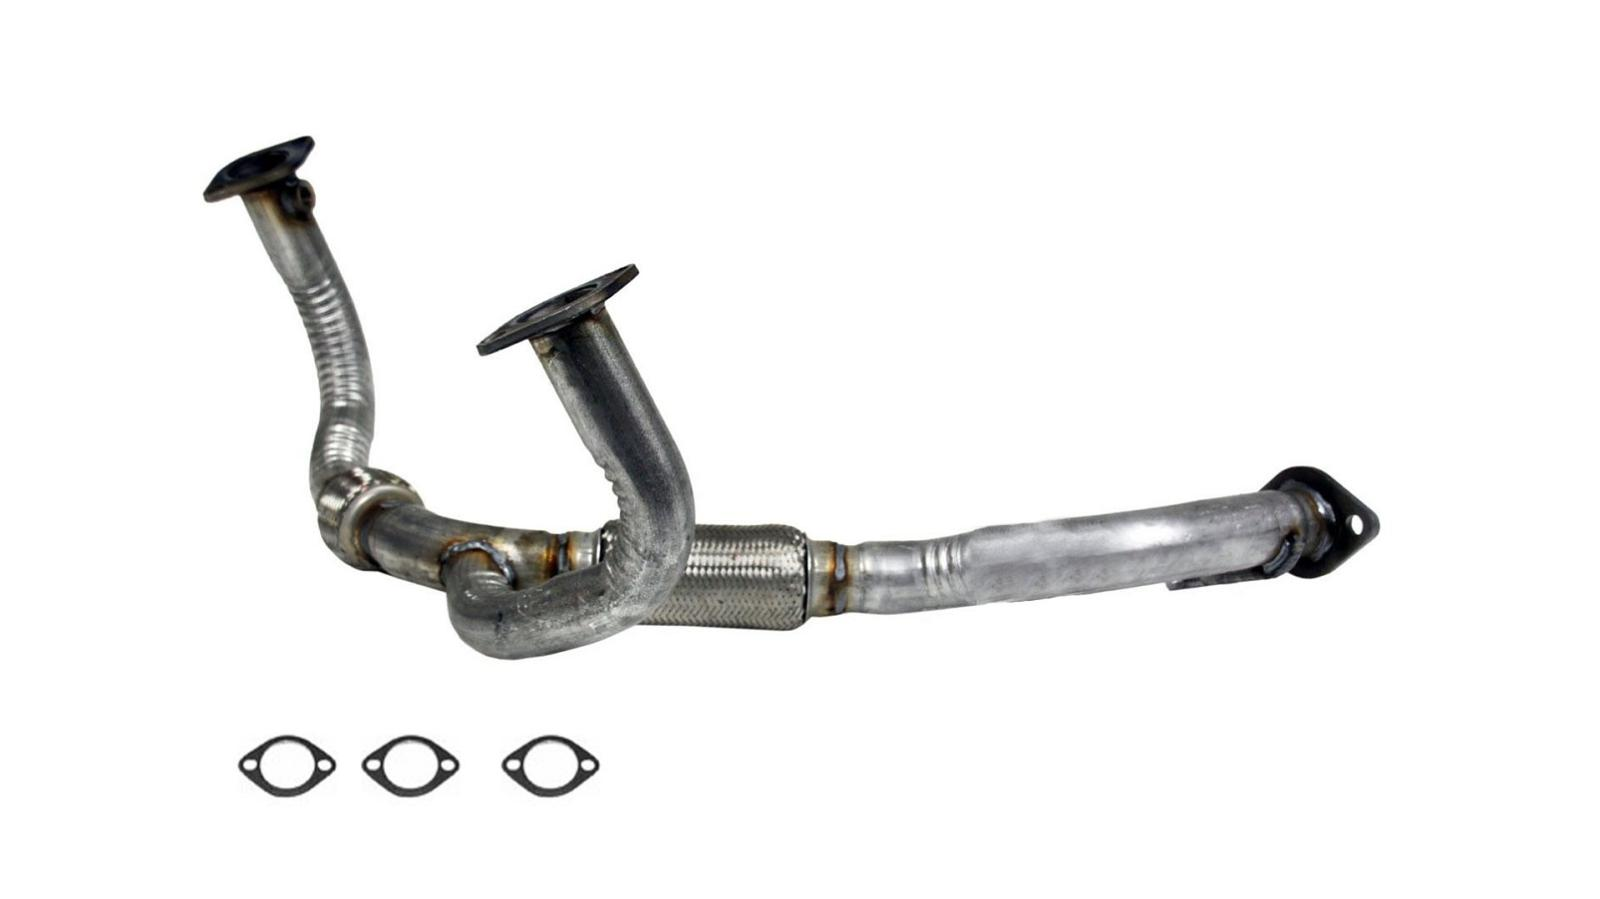 Kia Sorento Flex Pipe Repair Kit